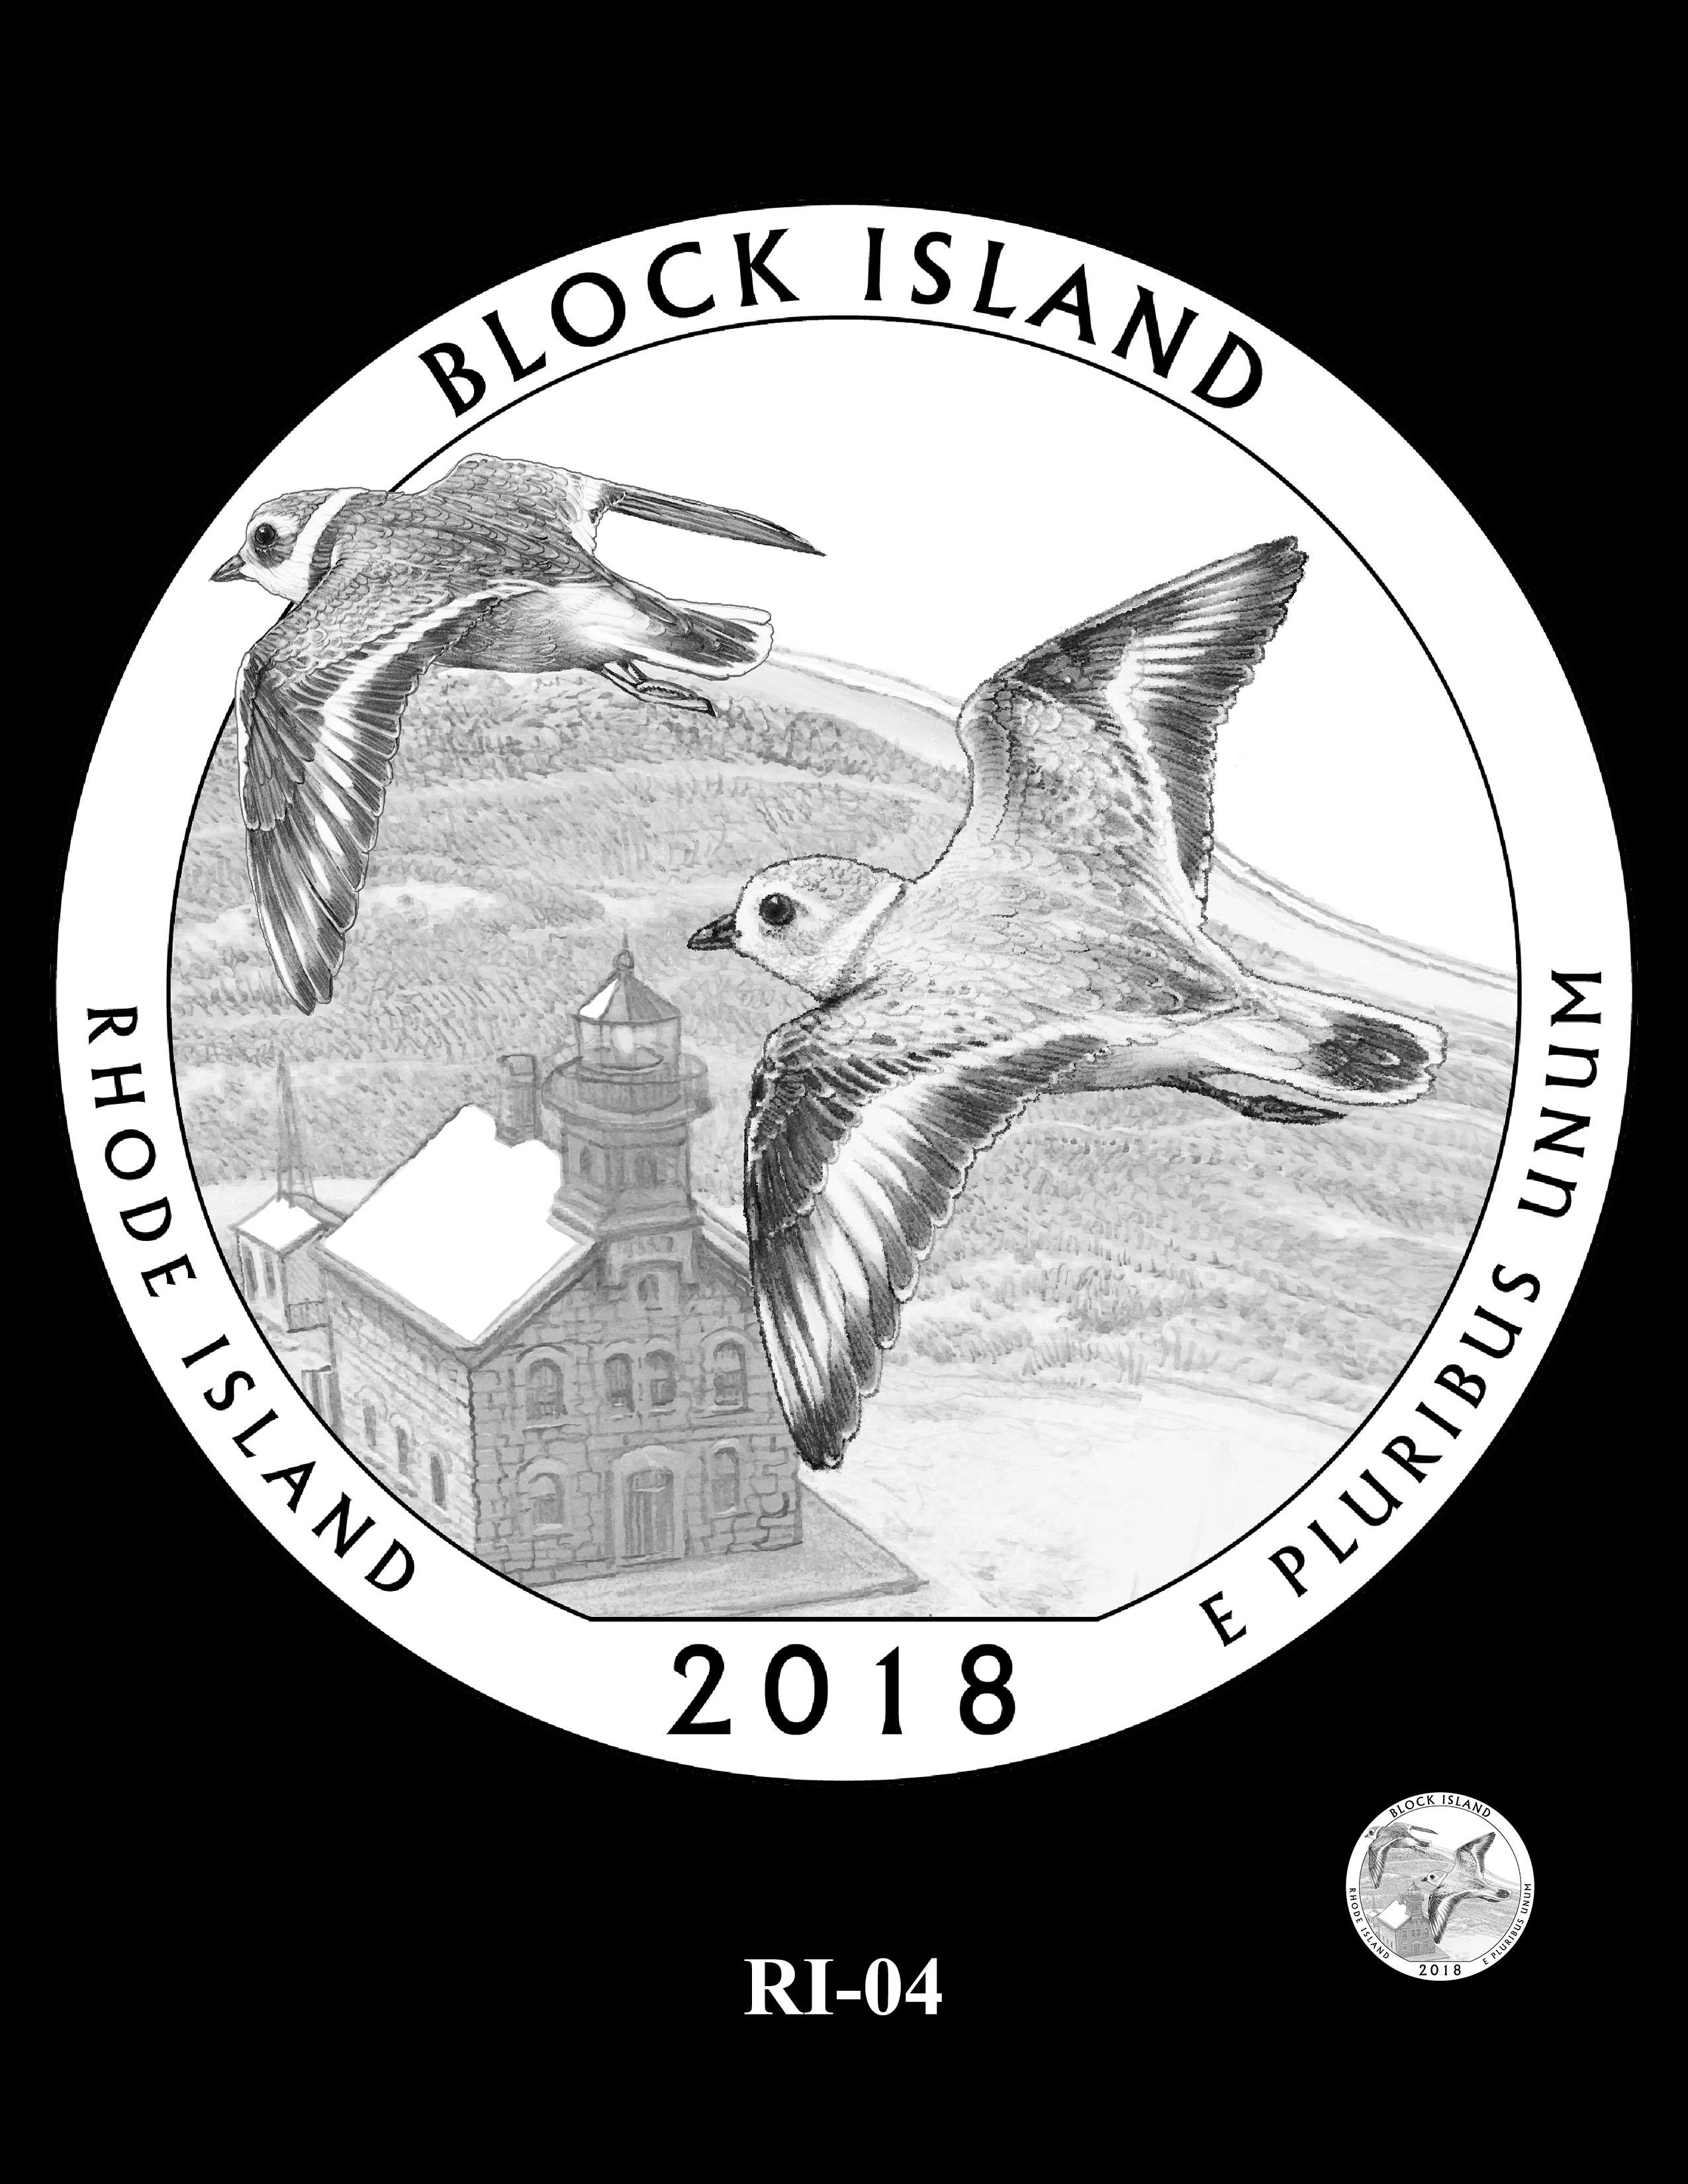 RI-04 -- 2018 America the Beautiful® Quarters Program